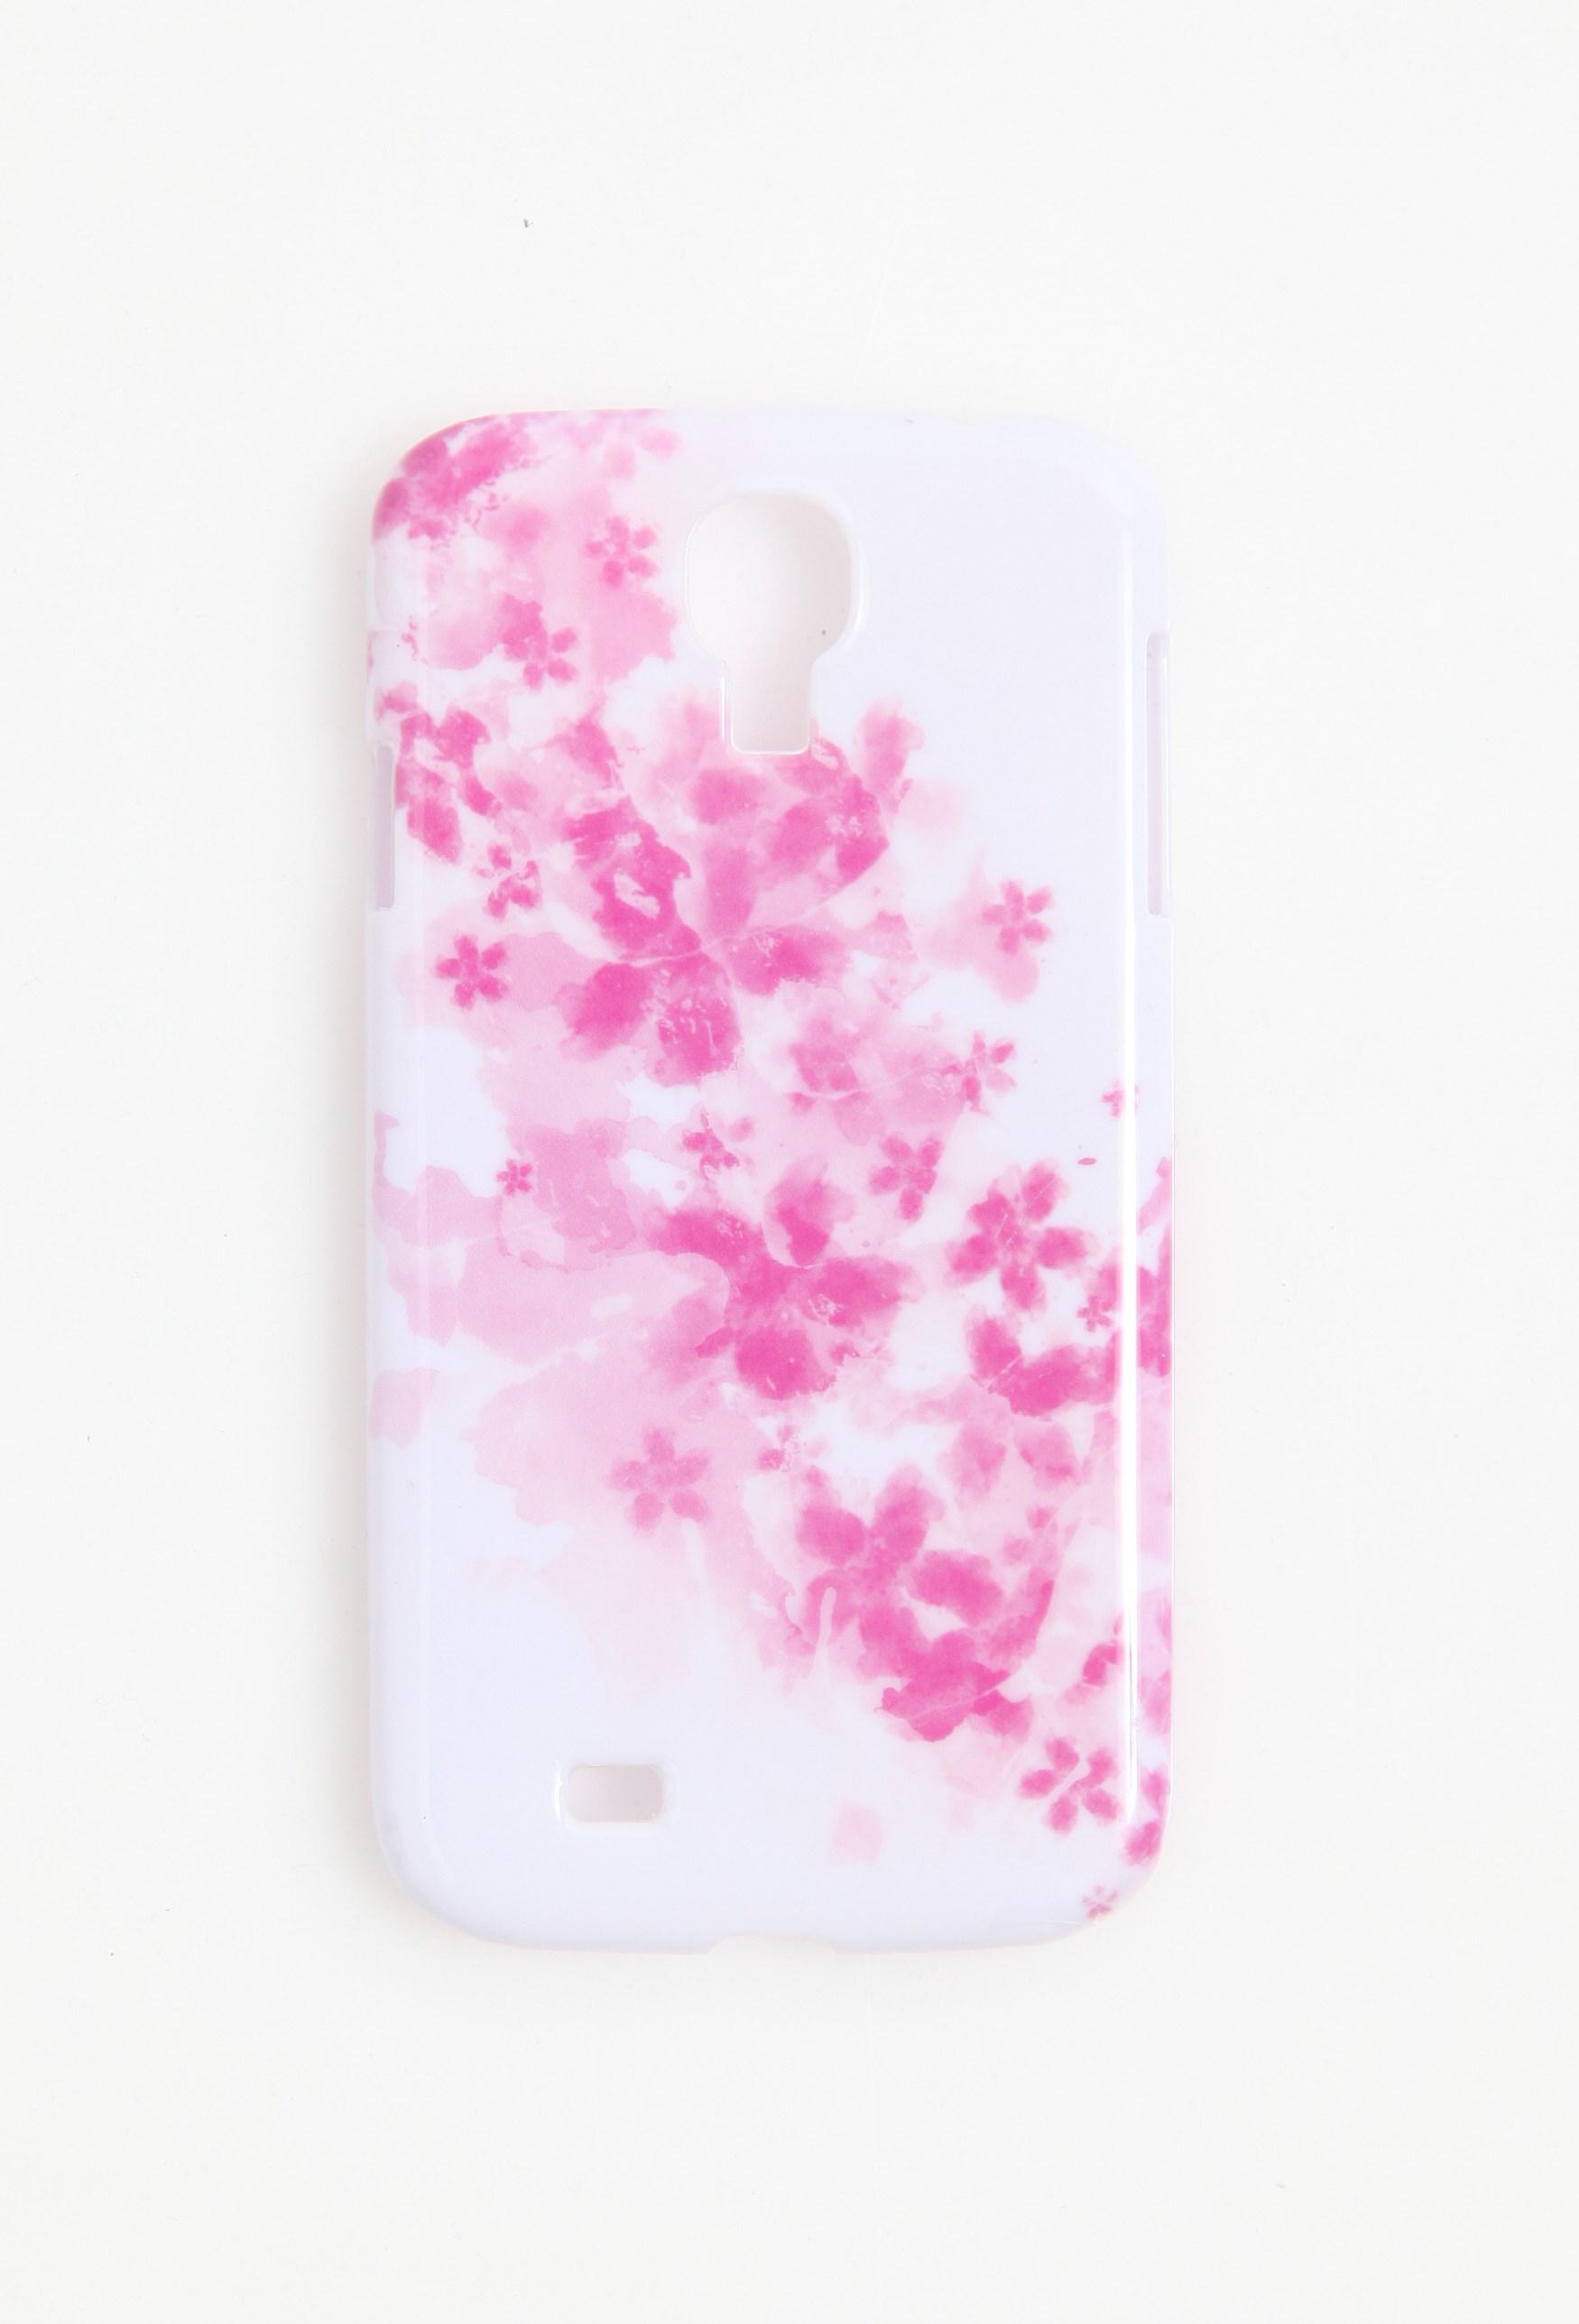 【Polyantha/ポリアンサ】大人の風格!日本の伝統美・桜を描写したGALAXY S4カバー